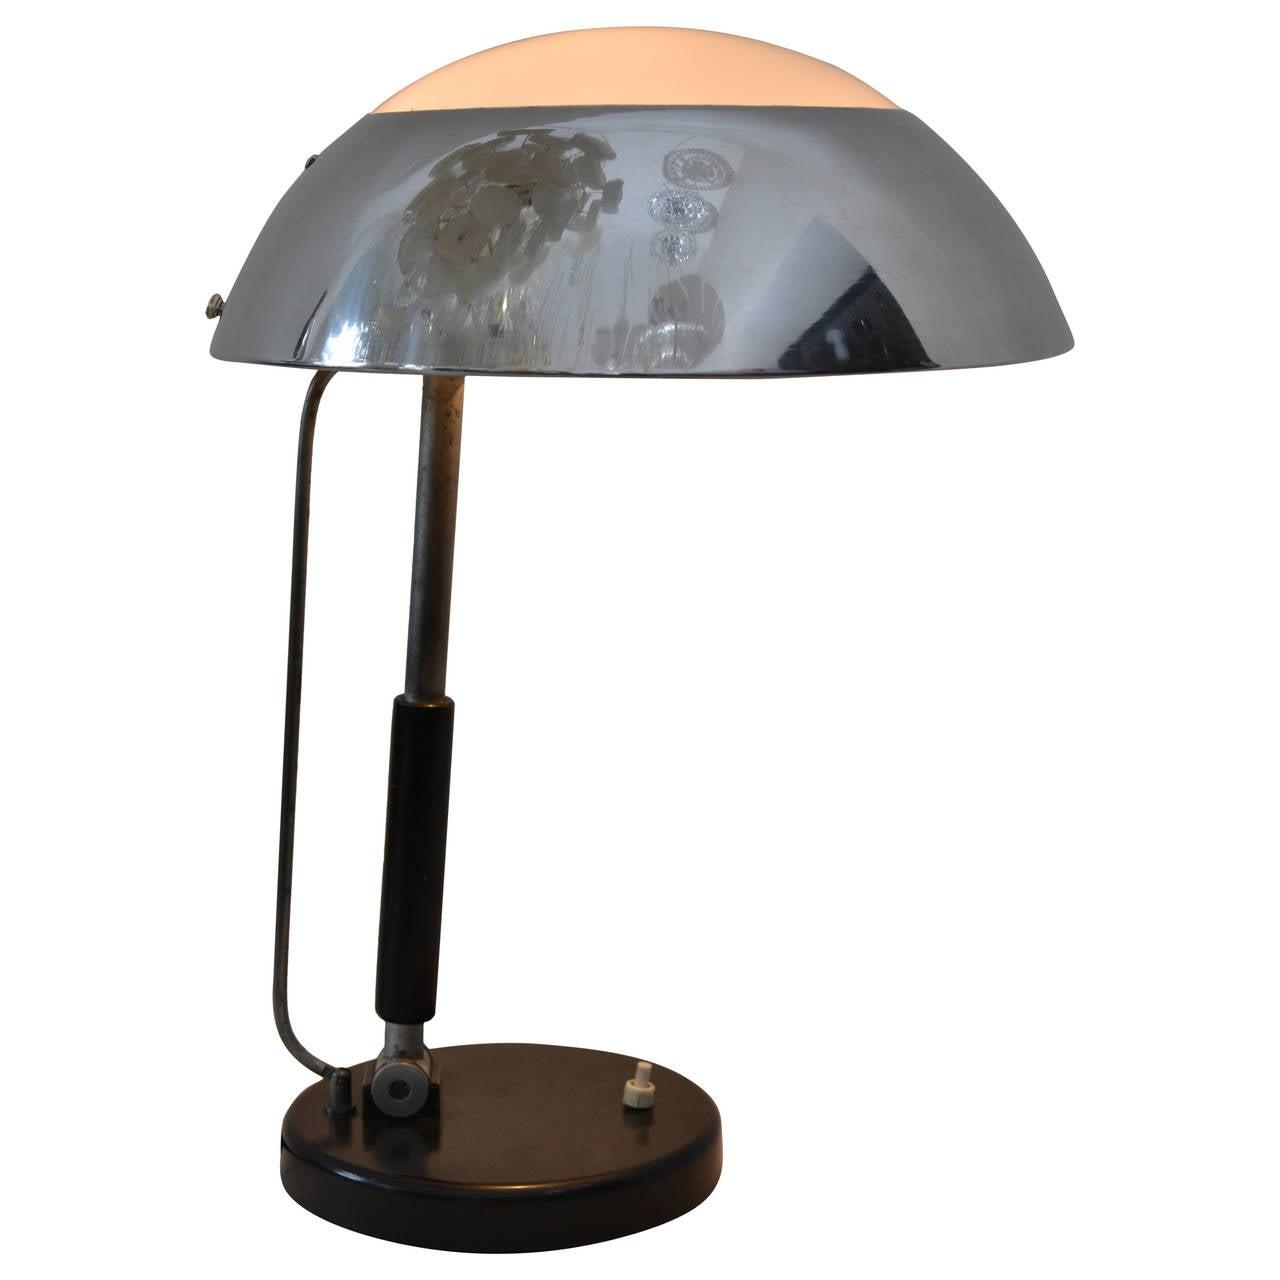 karl trabert industrial design desk lamp for sale at 1stdibs ForIndustrial Design Table Lamps